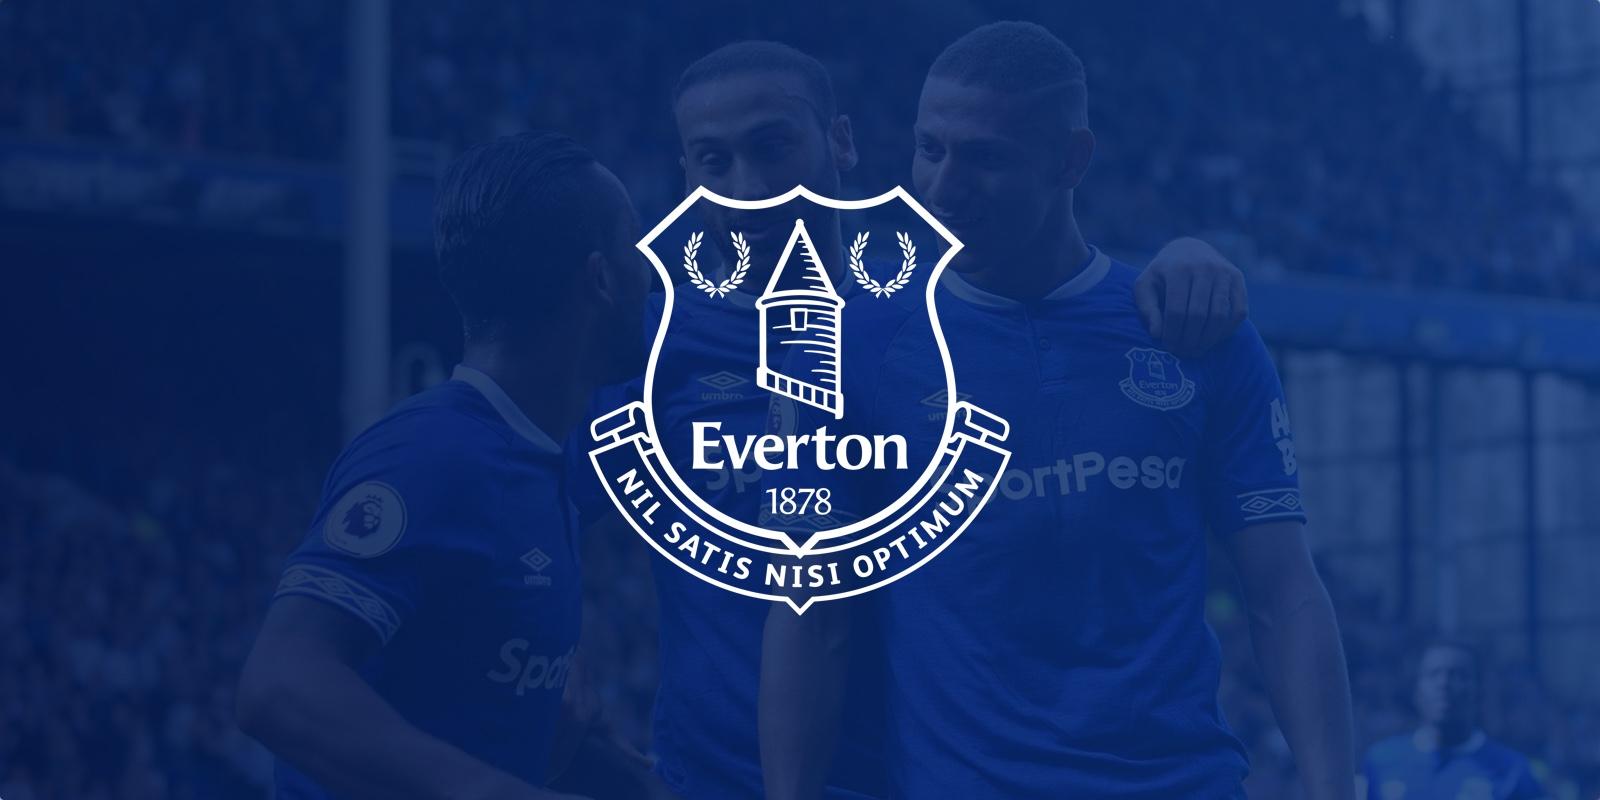 Home | Everton Football Club